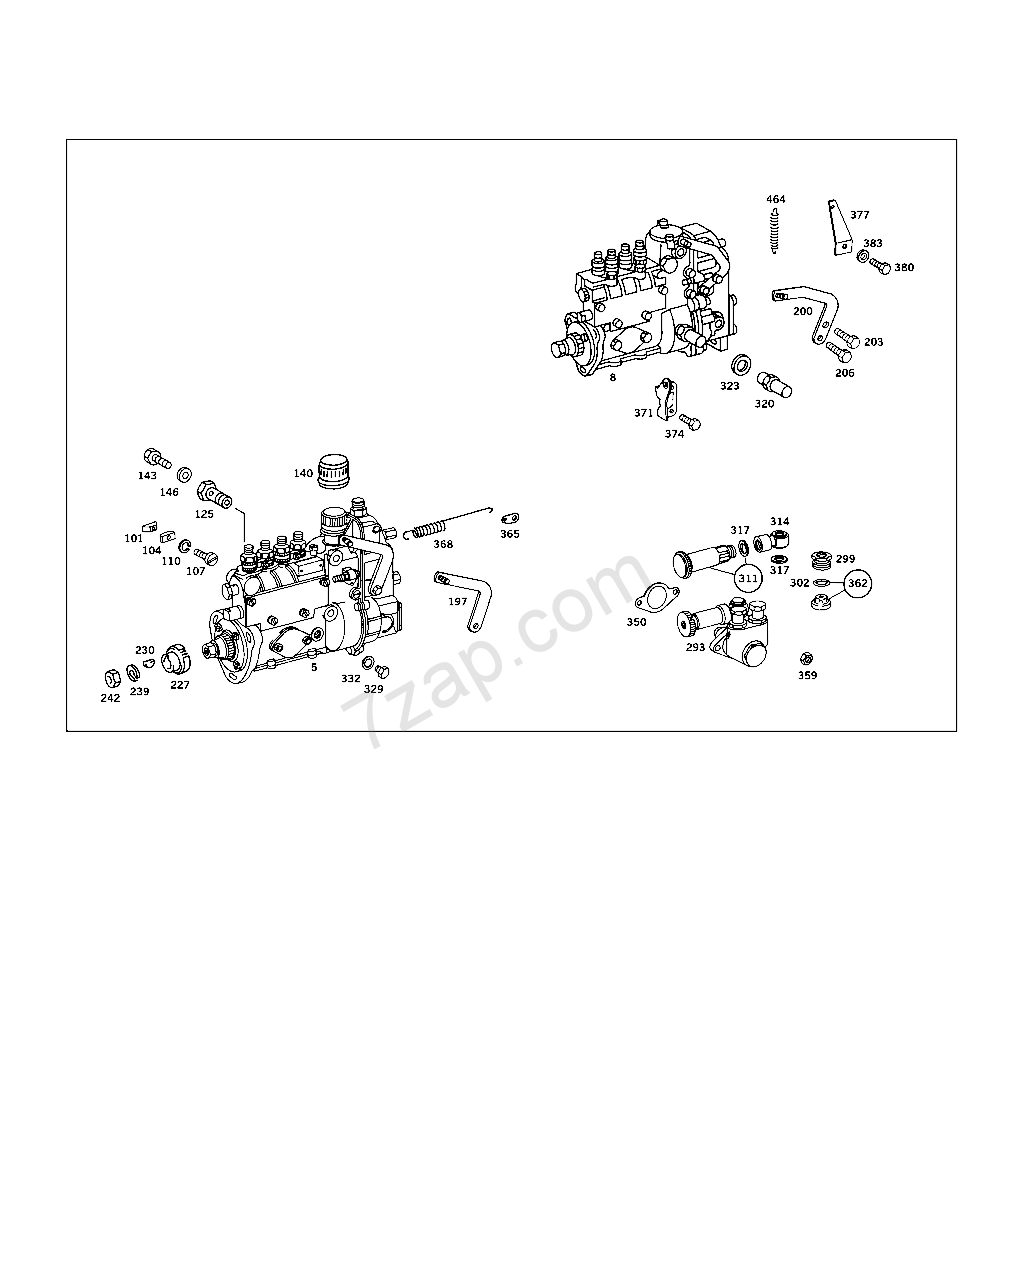 prise d'air circuit gasoil - Page 2 Wdb42111